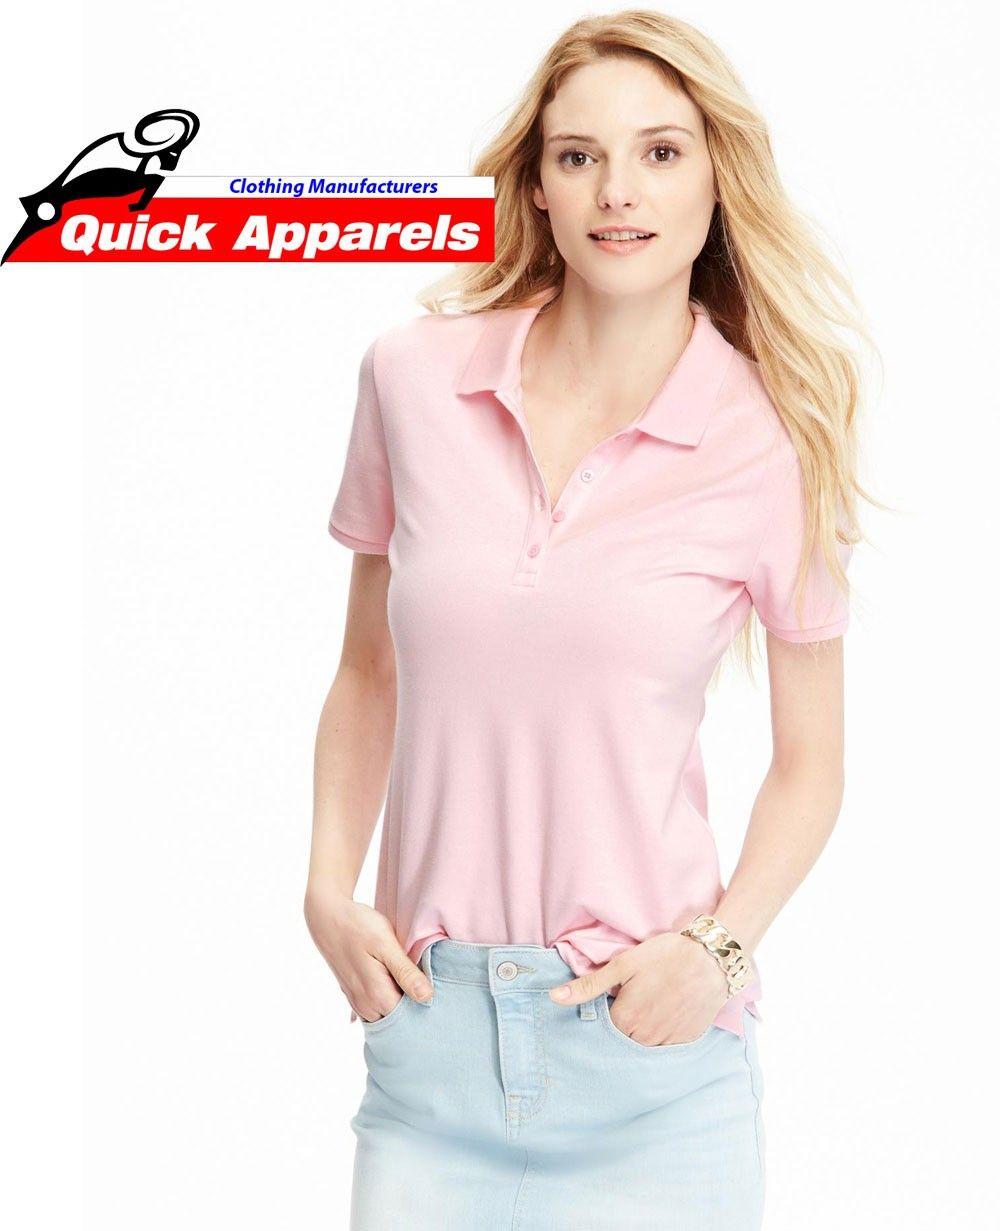 e273b3532 http   www.quickapparels.com best-selling-women-